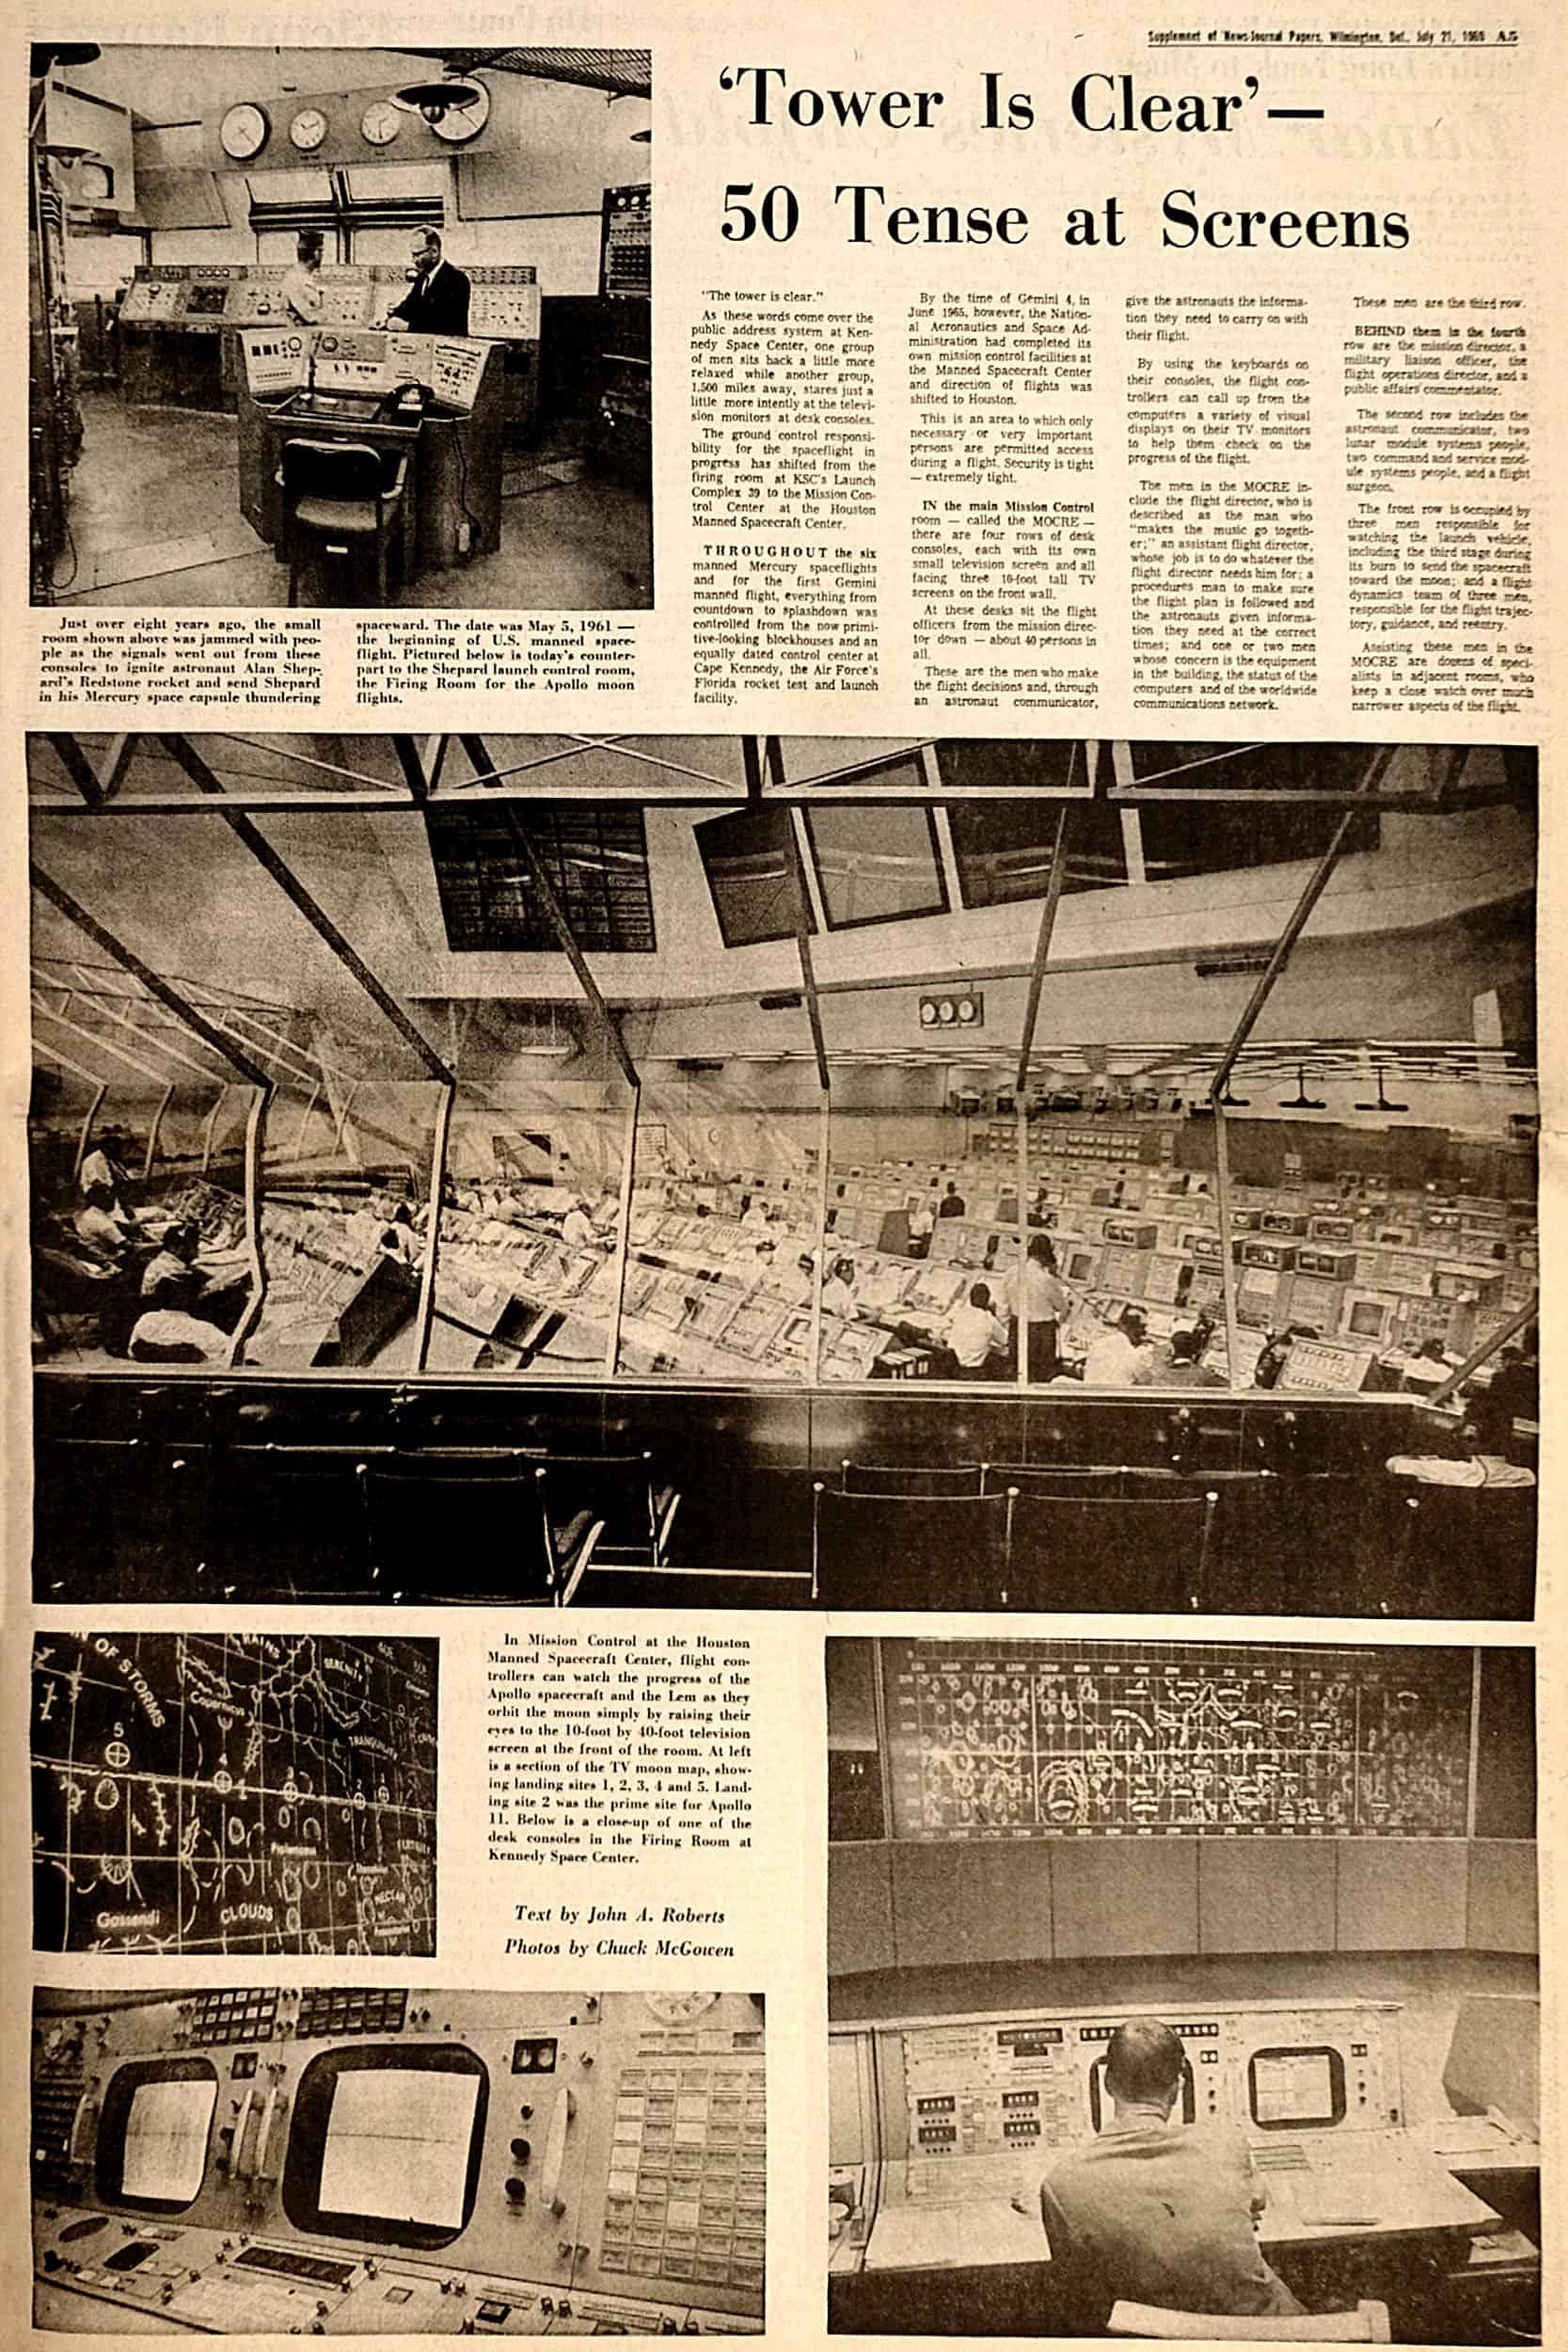 1969 – The Morning News: Man Steps onto Moon   University of